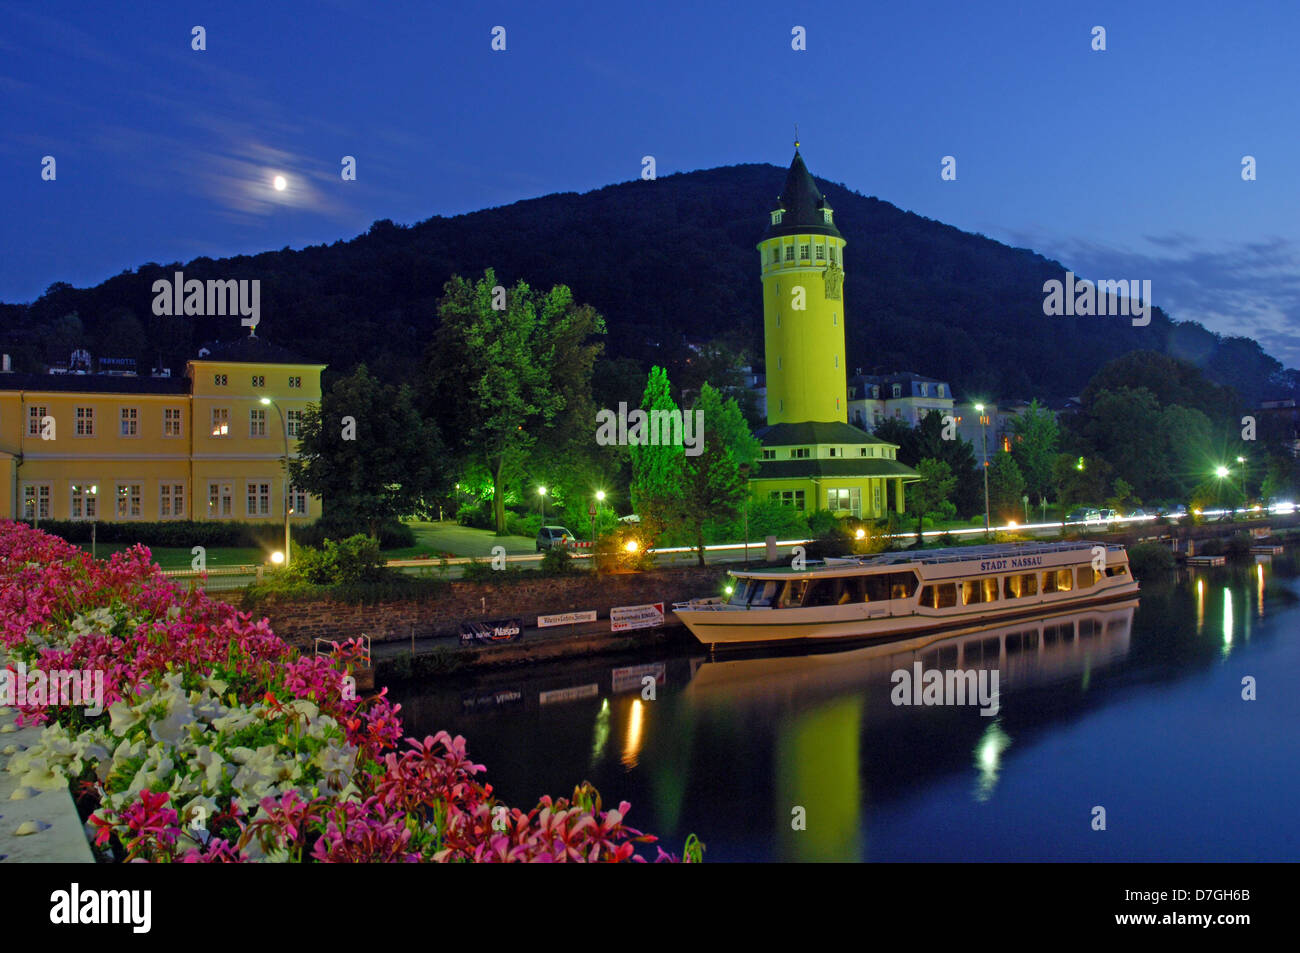 Germany, Rheinland-Pfalz, Bad Ems - Stock Image